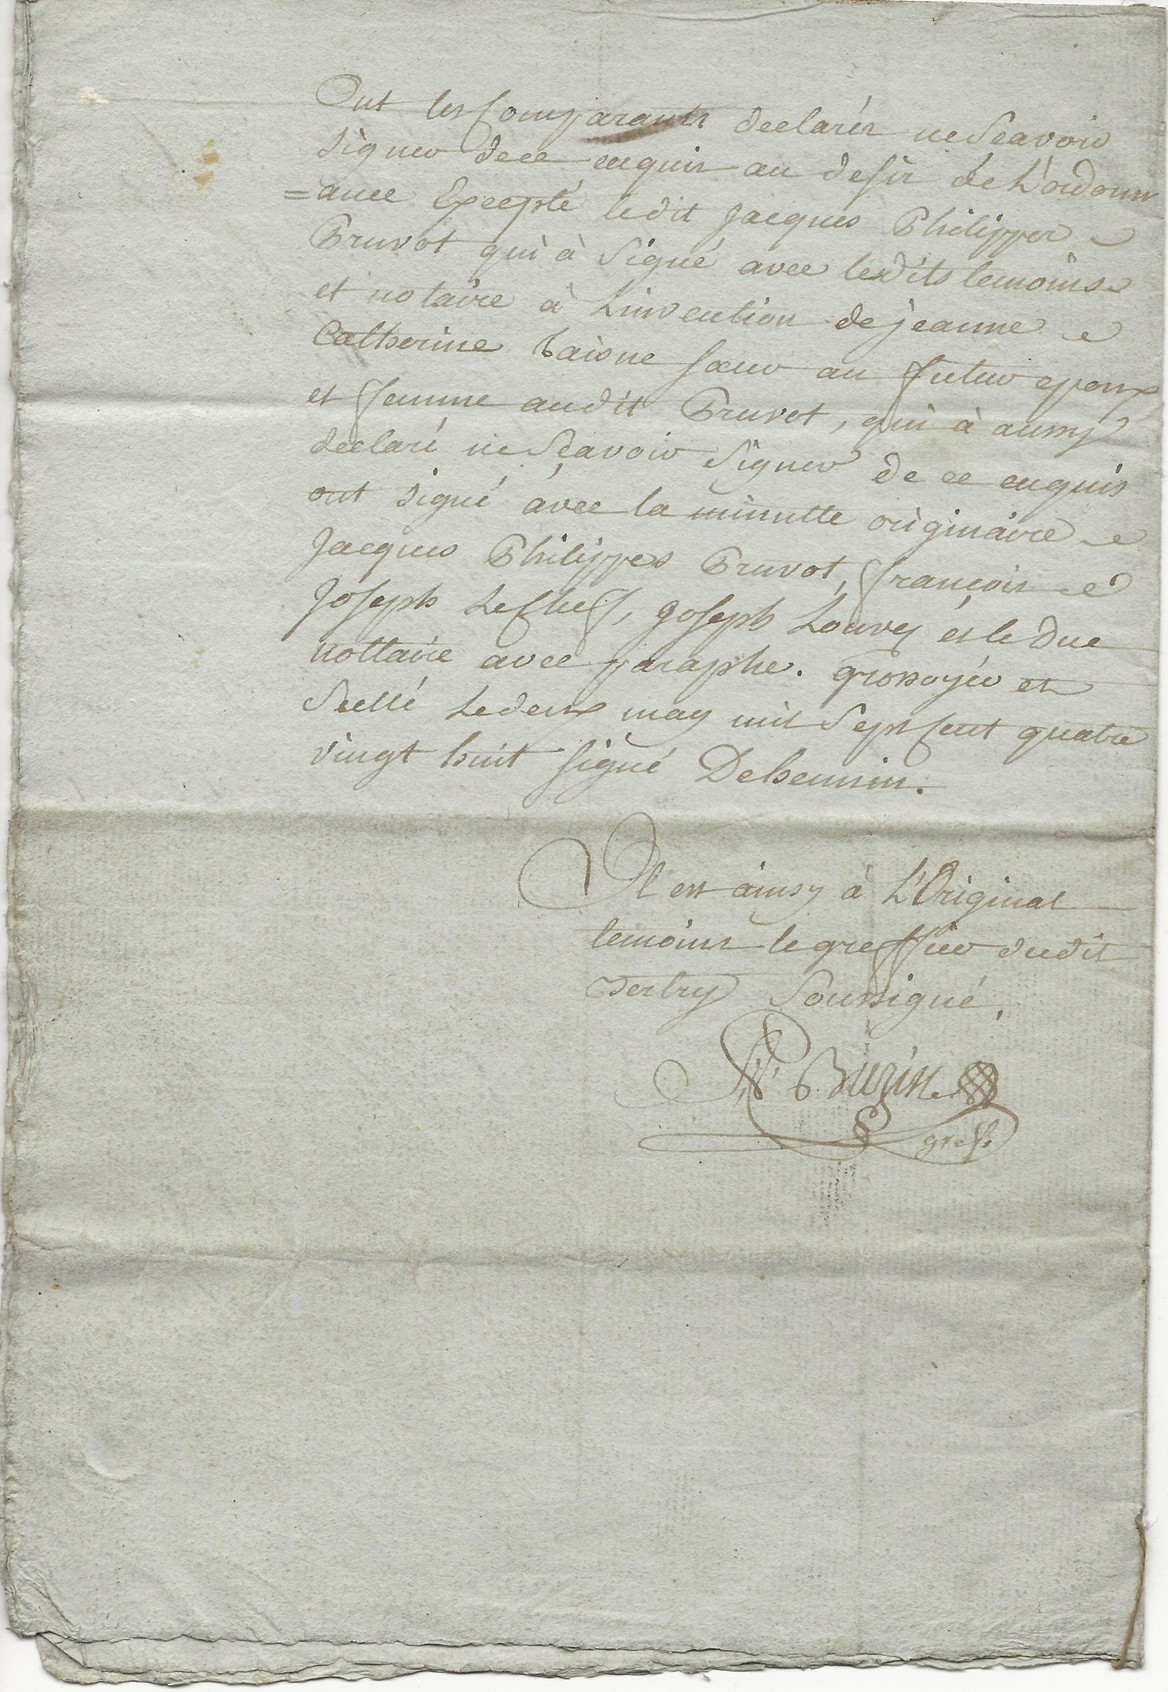 1788 contrat mariage seraphin taine x anne leduc 008